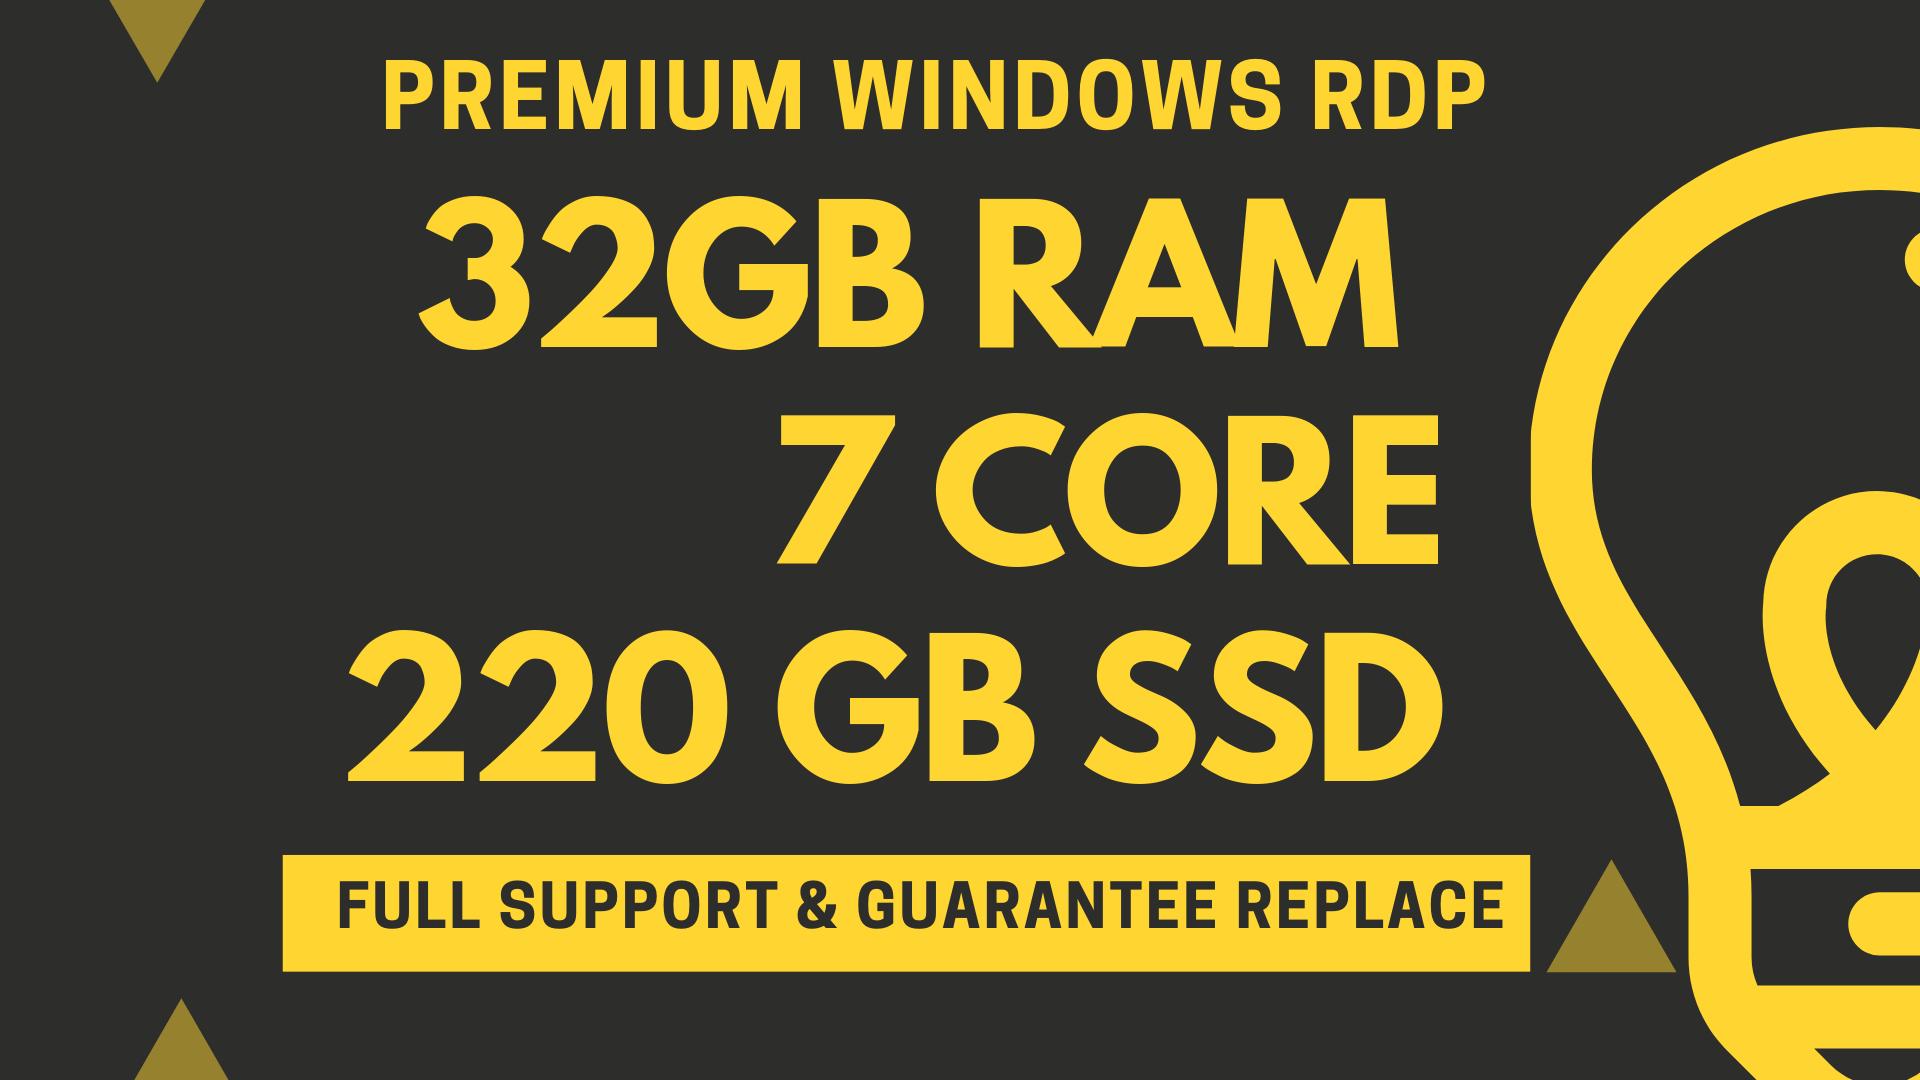 PREMIUM VPS WINDOWS RDP 32GB RAM 7CORE 220GB SSD